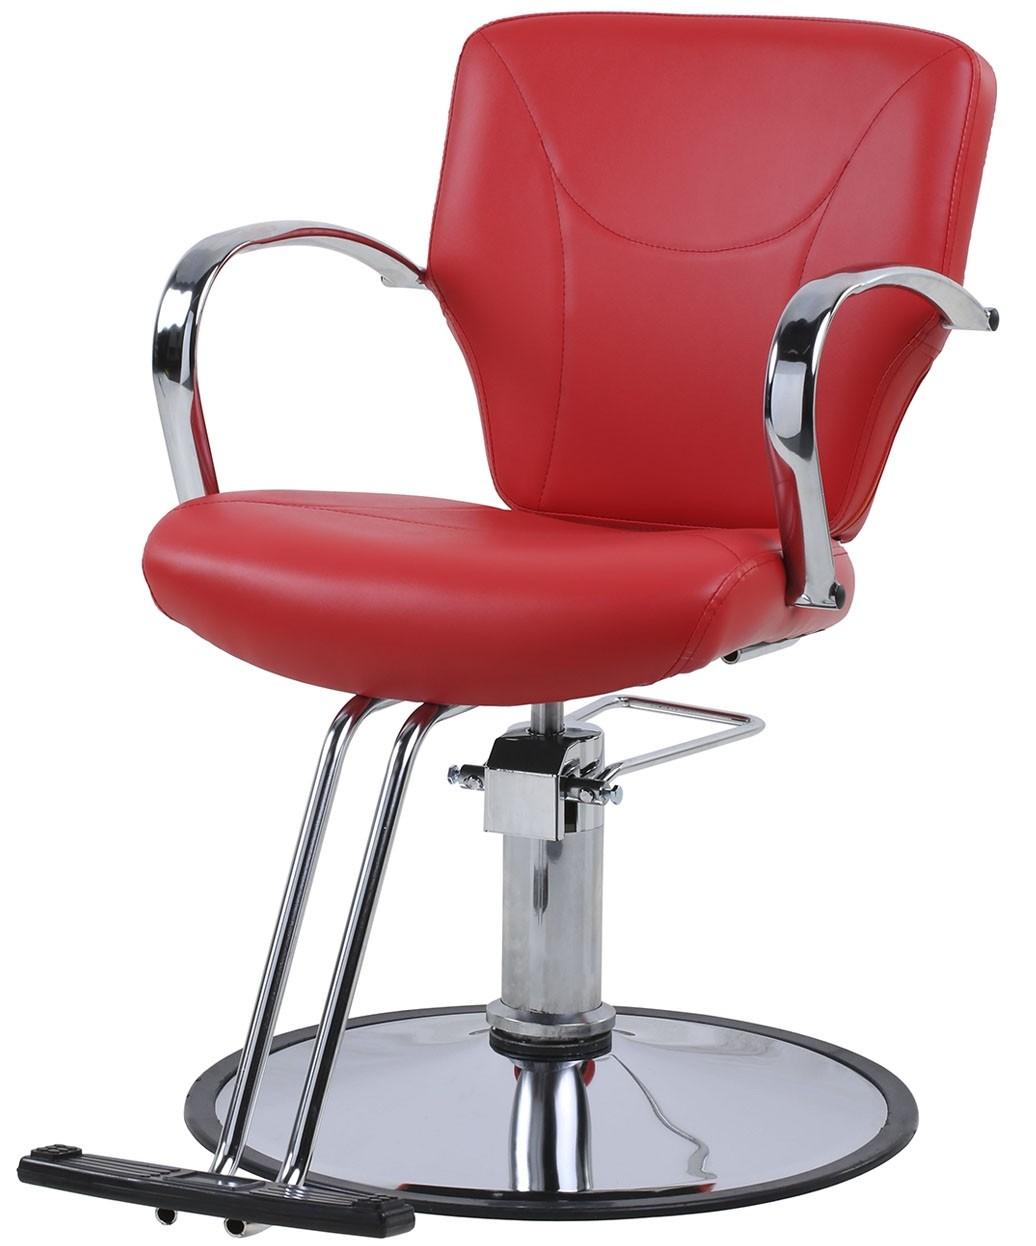 Reba Styling Chair